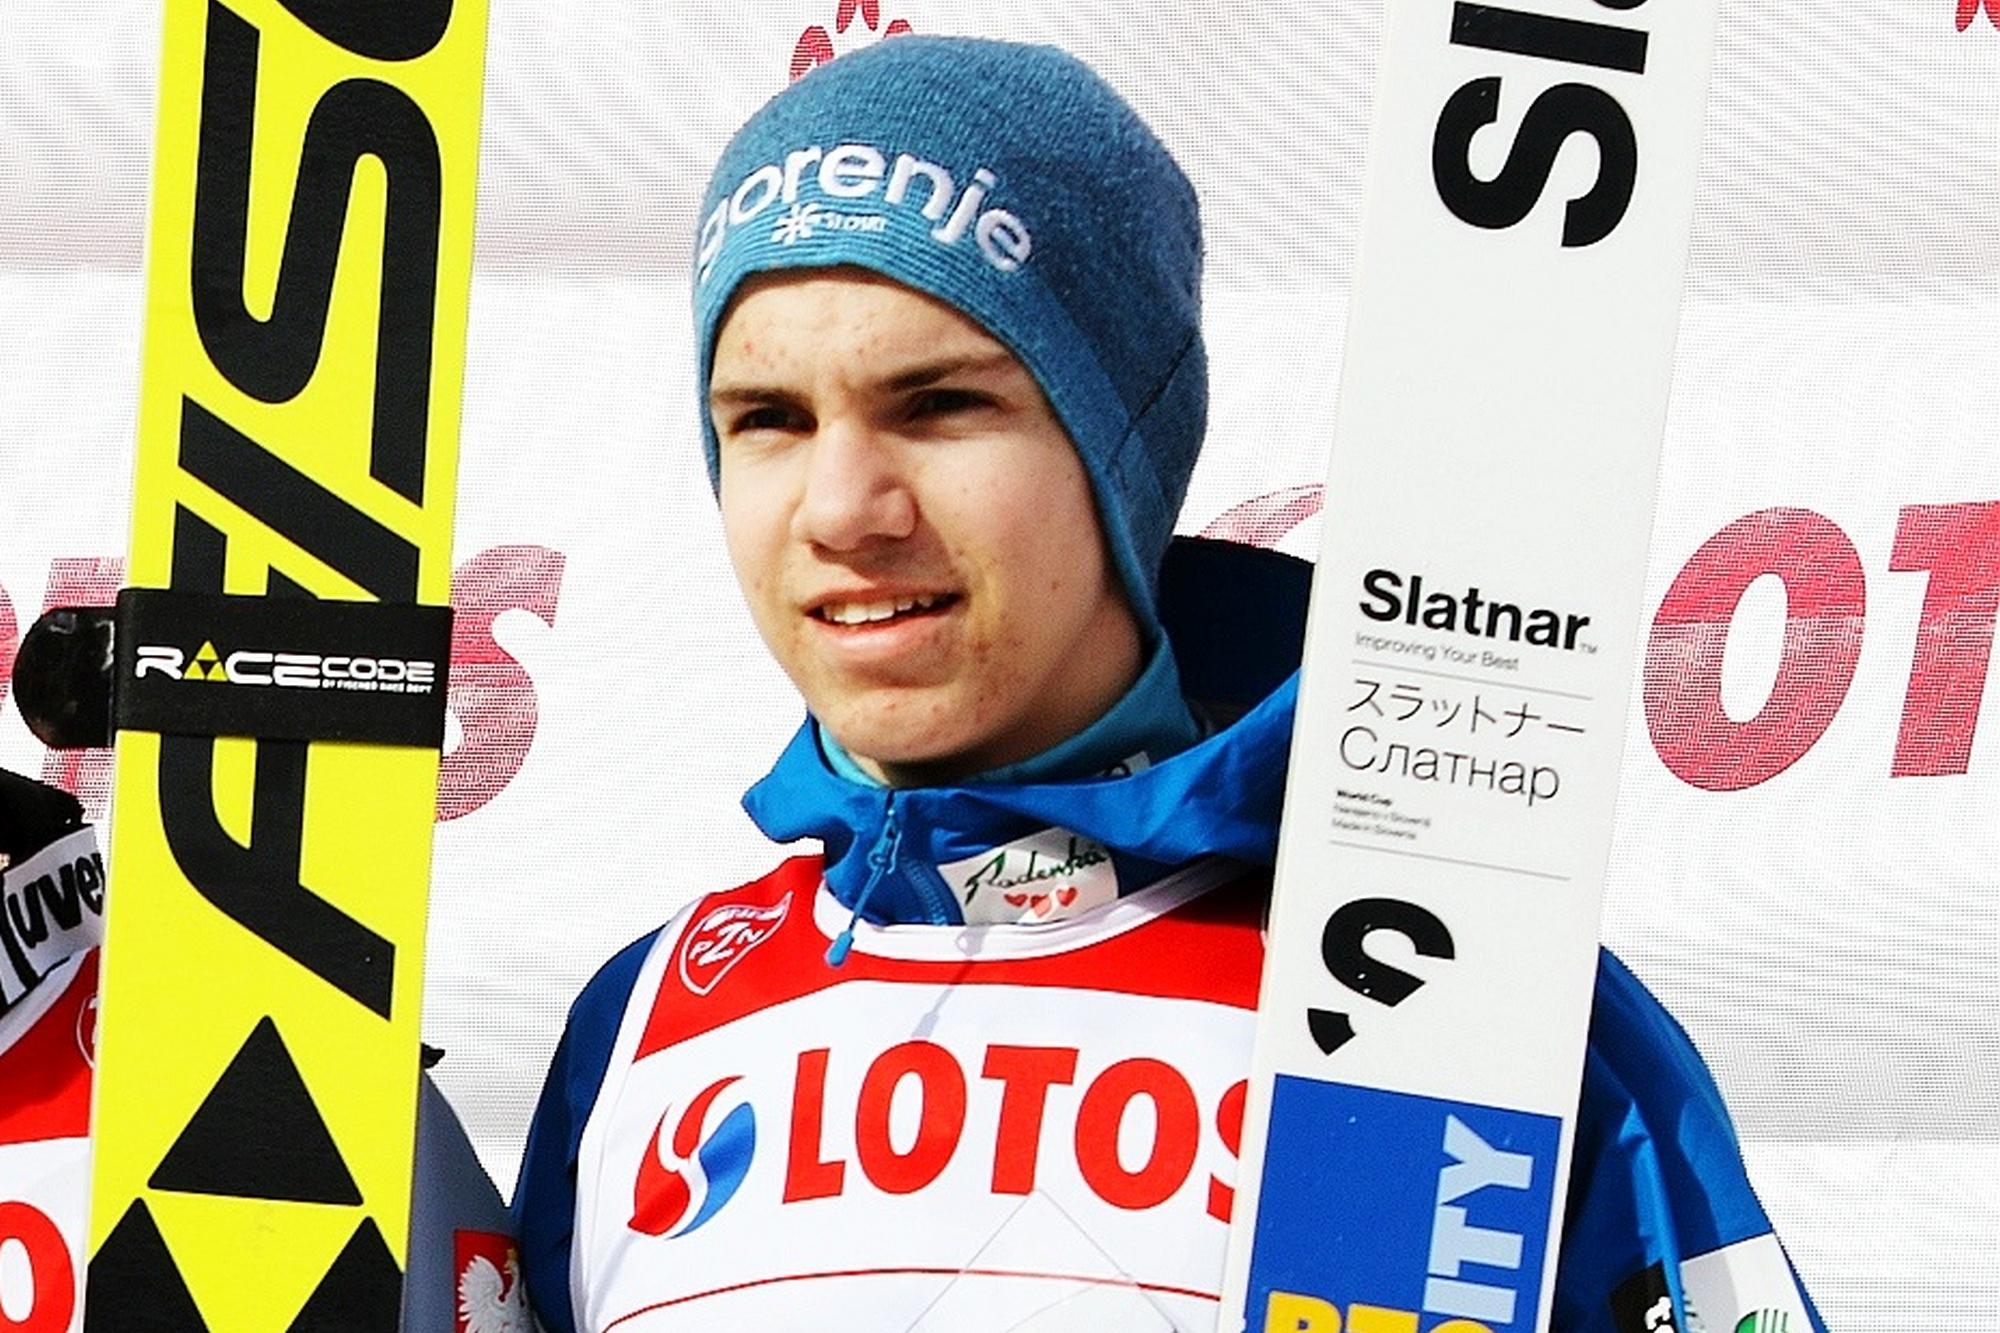 Alpen Cup: Mogel, Bachlinger, Repinc Zupancic i Ulrichova ze zwycięstwami